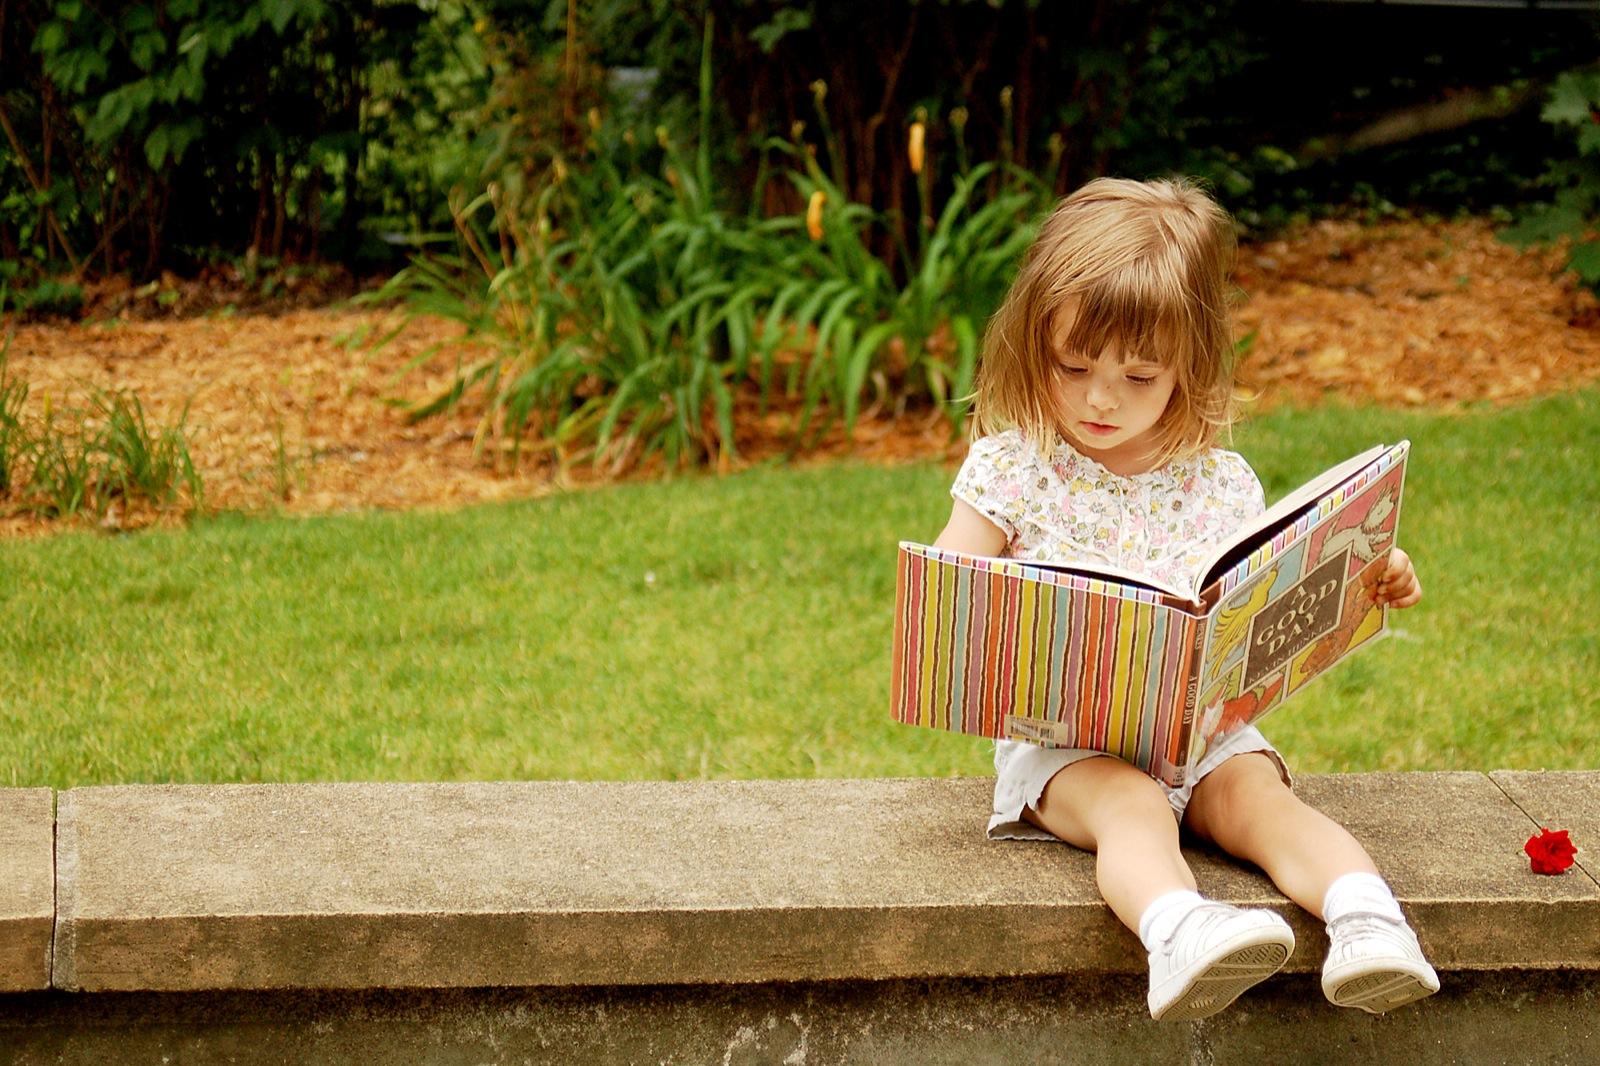 Картинка с изображением книги и ребенка